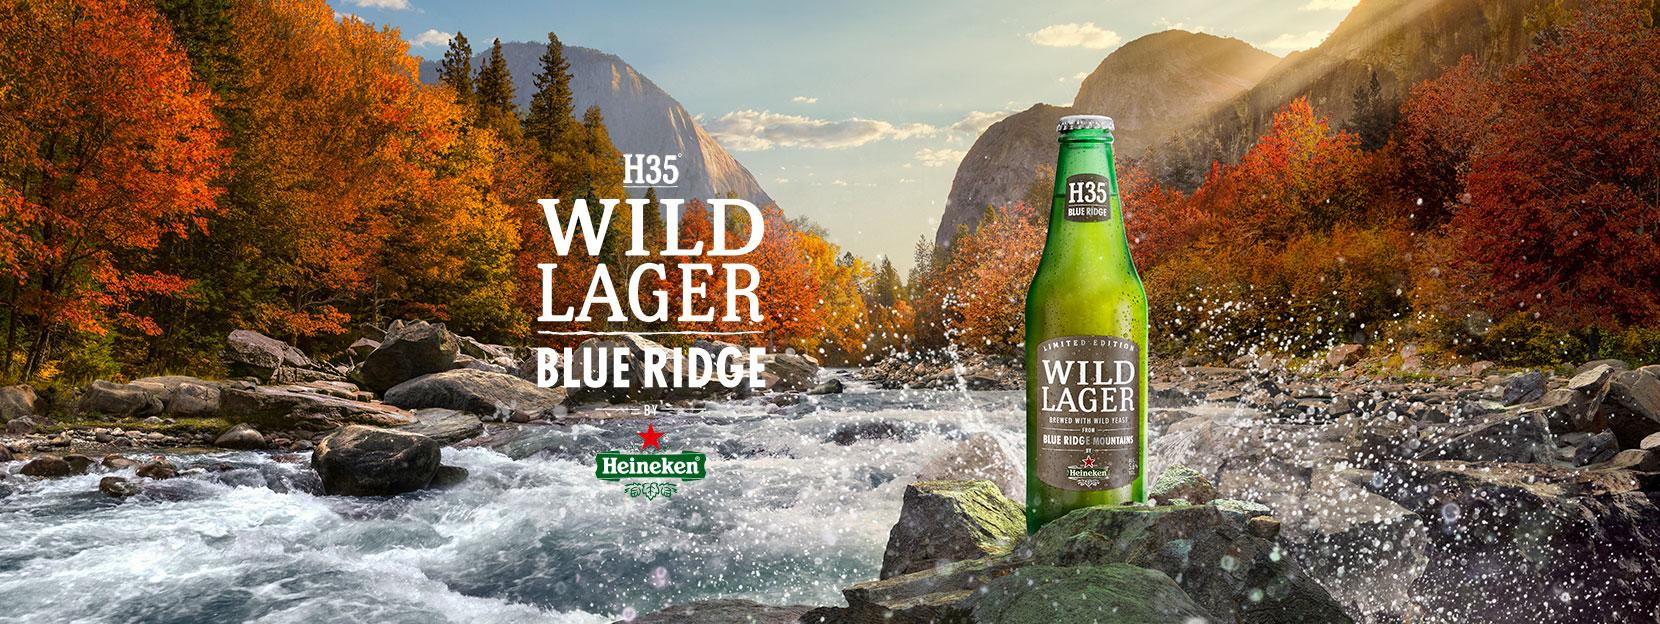 HEINEKEN® WILD LAGER BLUE RIDGE Hecha con levadura salvaje de las montañas Blue Ridge